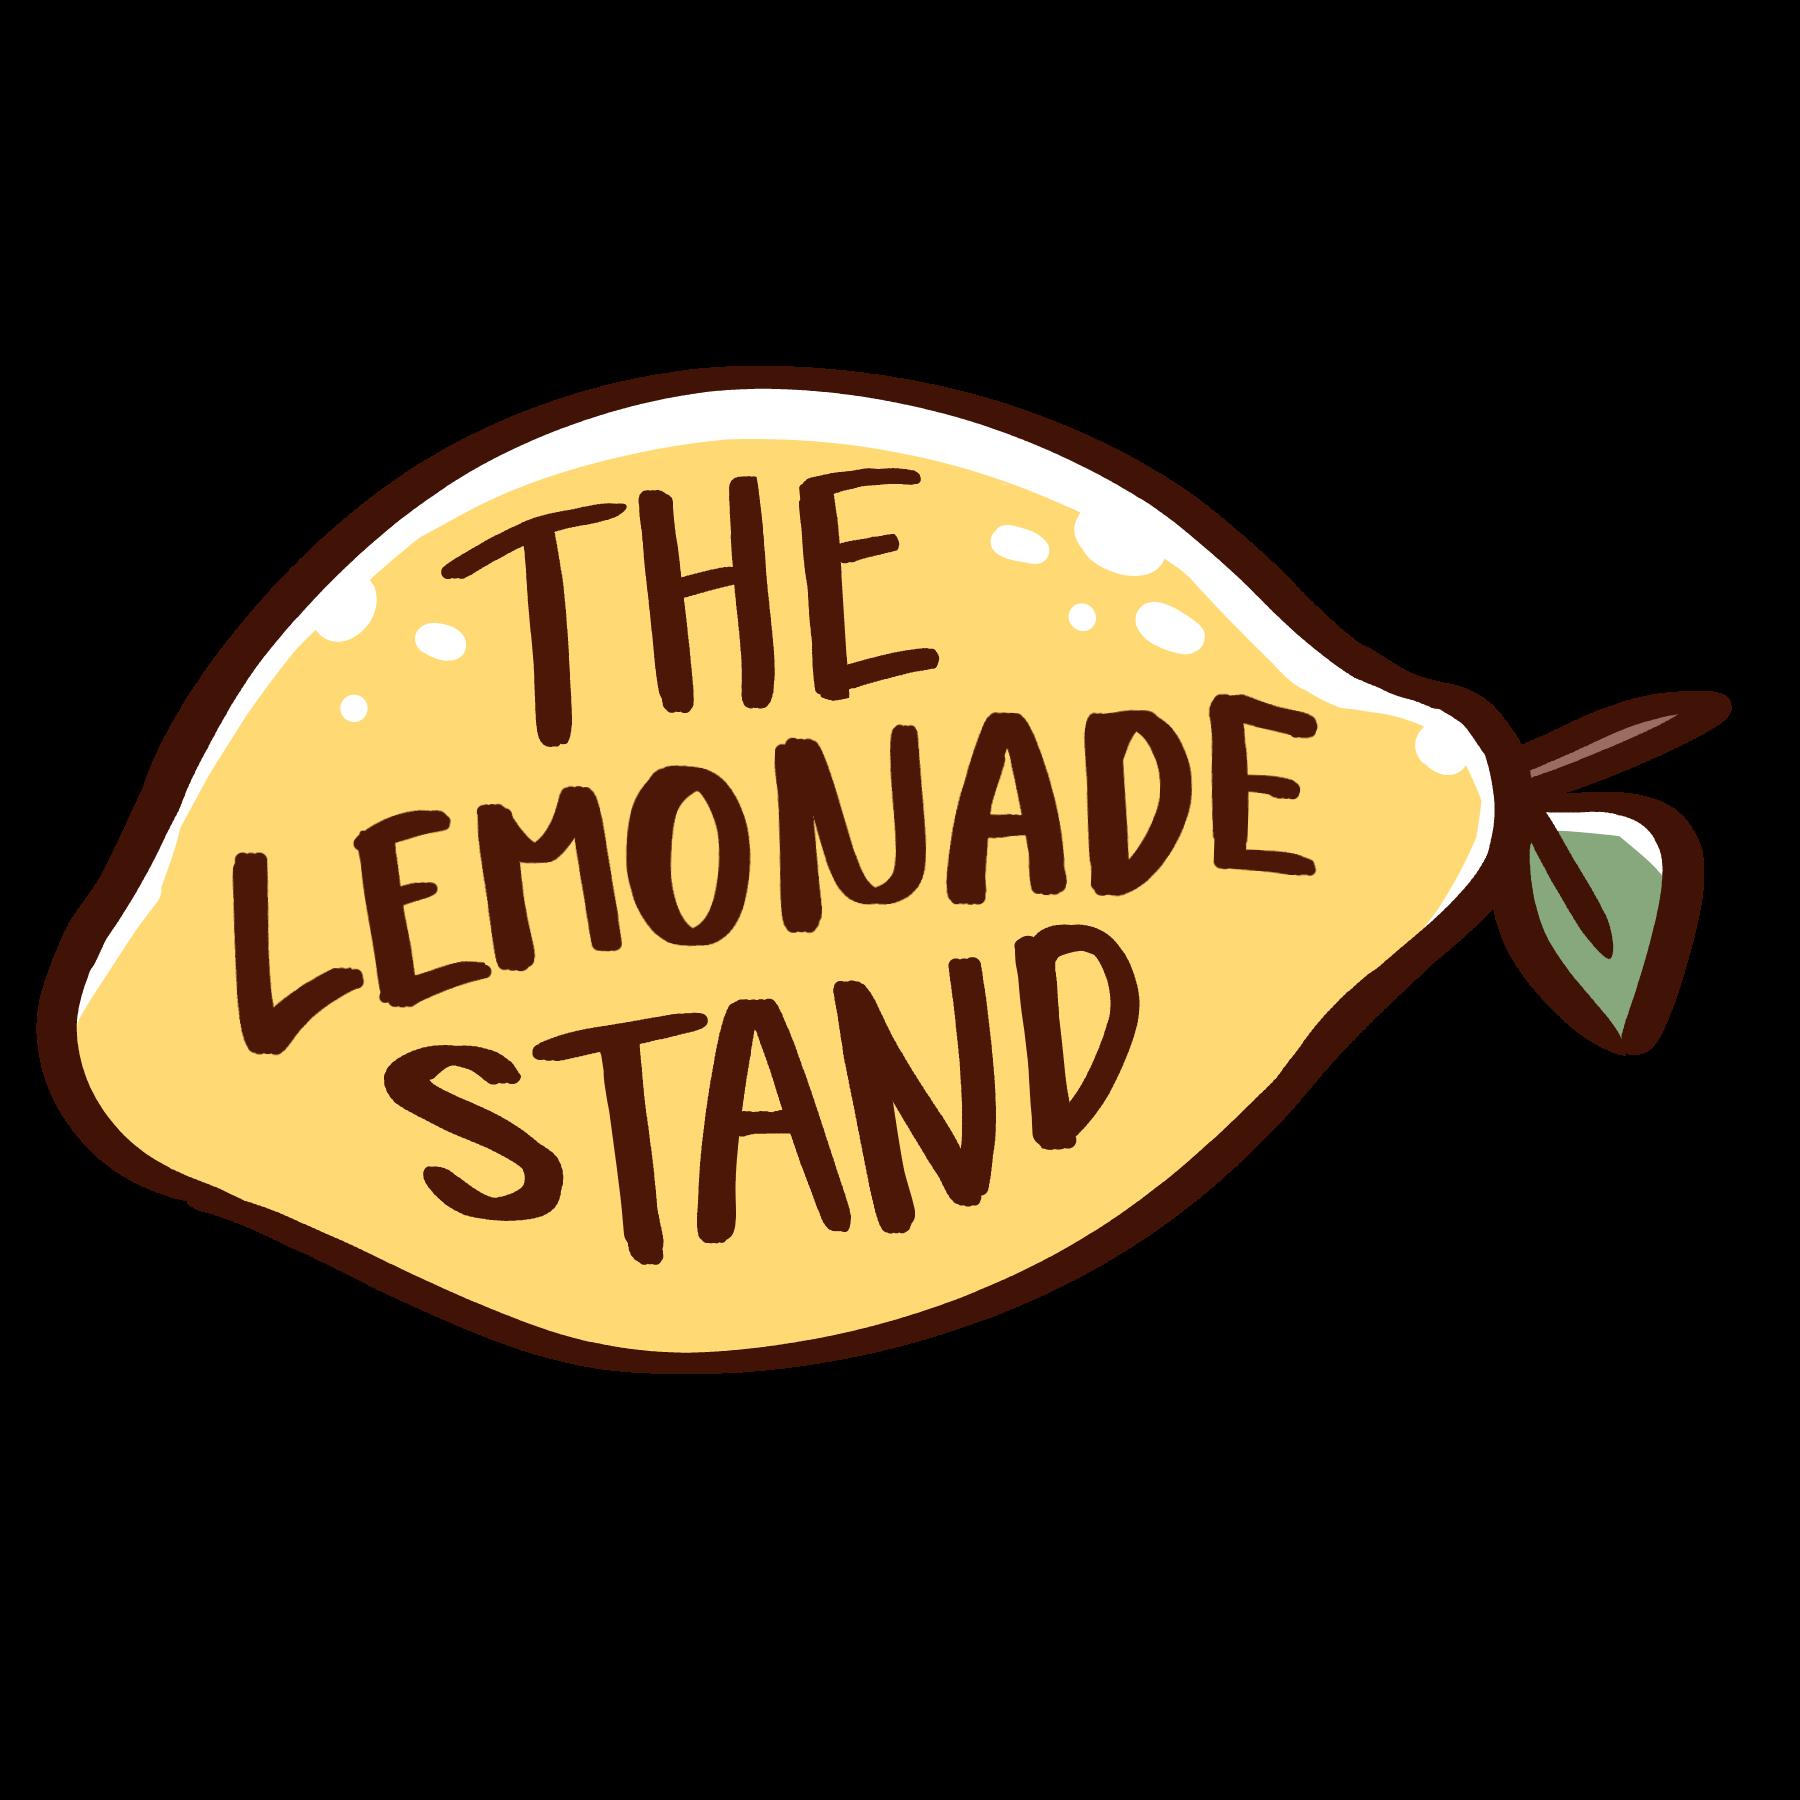 Logo lemonade stand